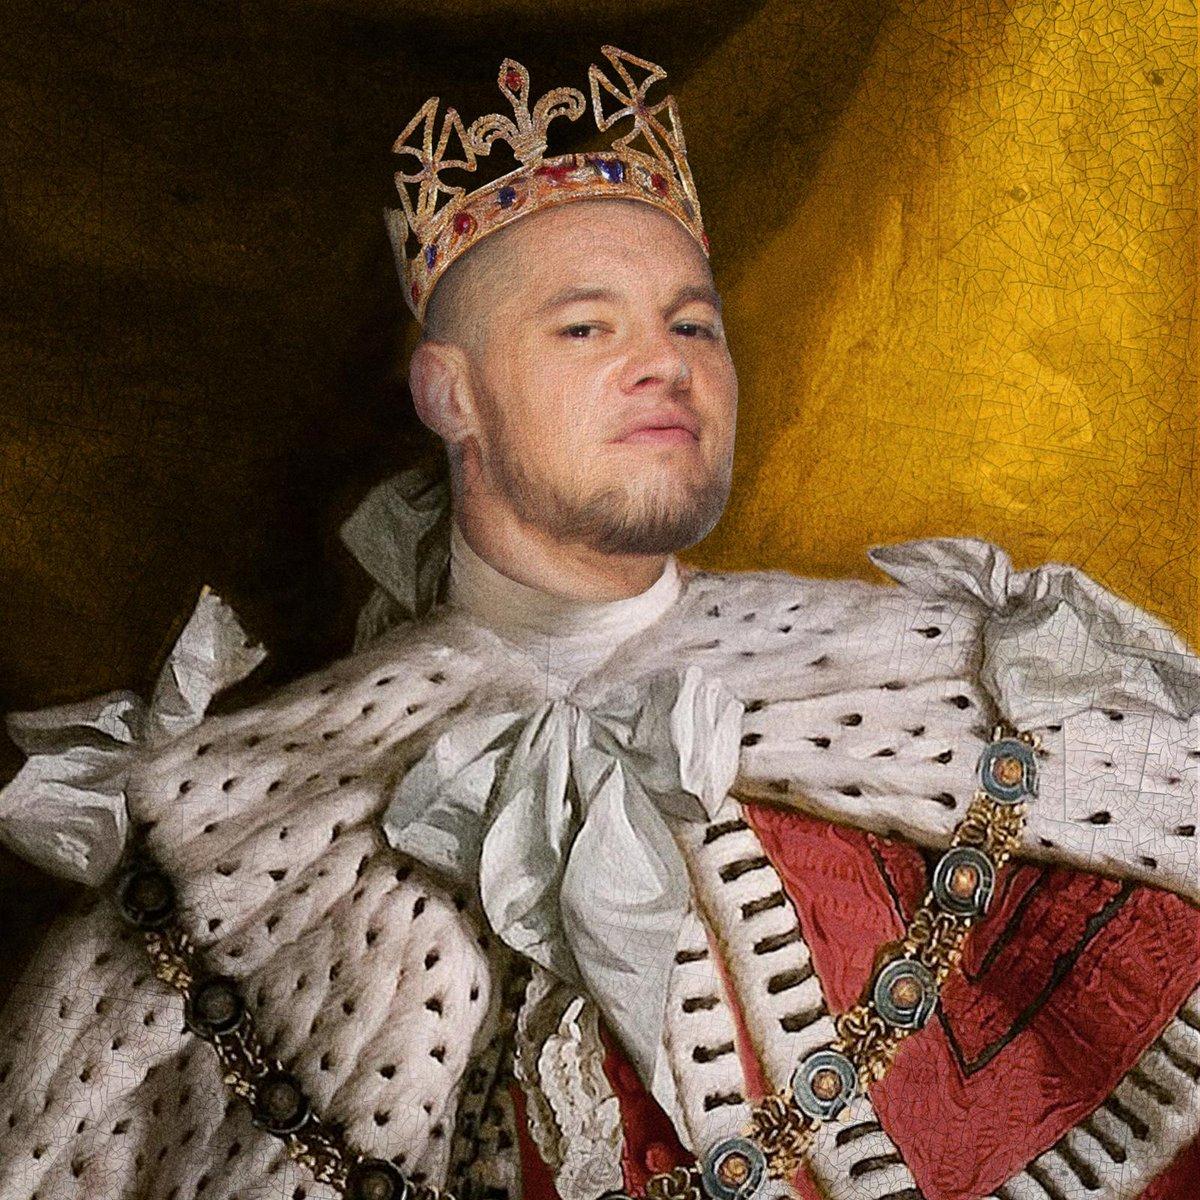 All hail KING @BaronCorbinWWE! #KingOfTheRing 👑